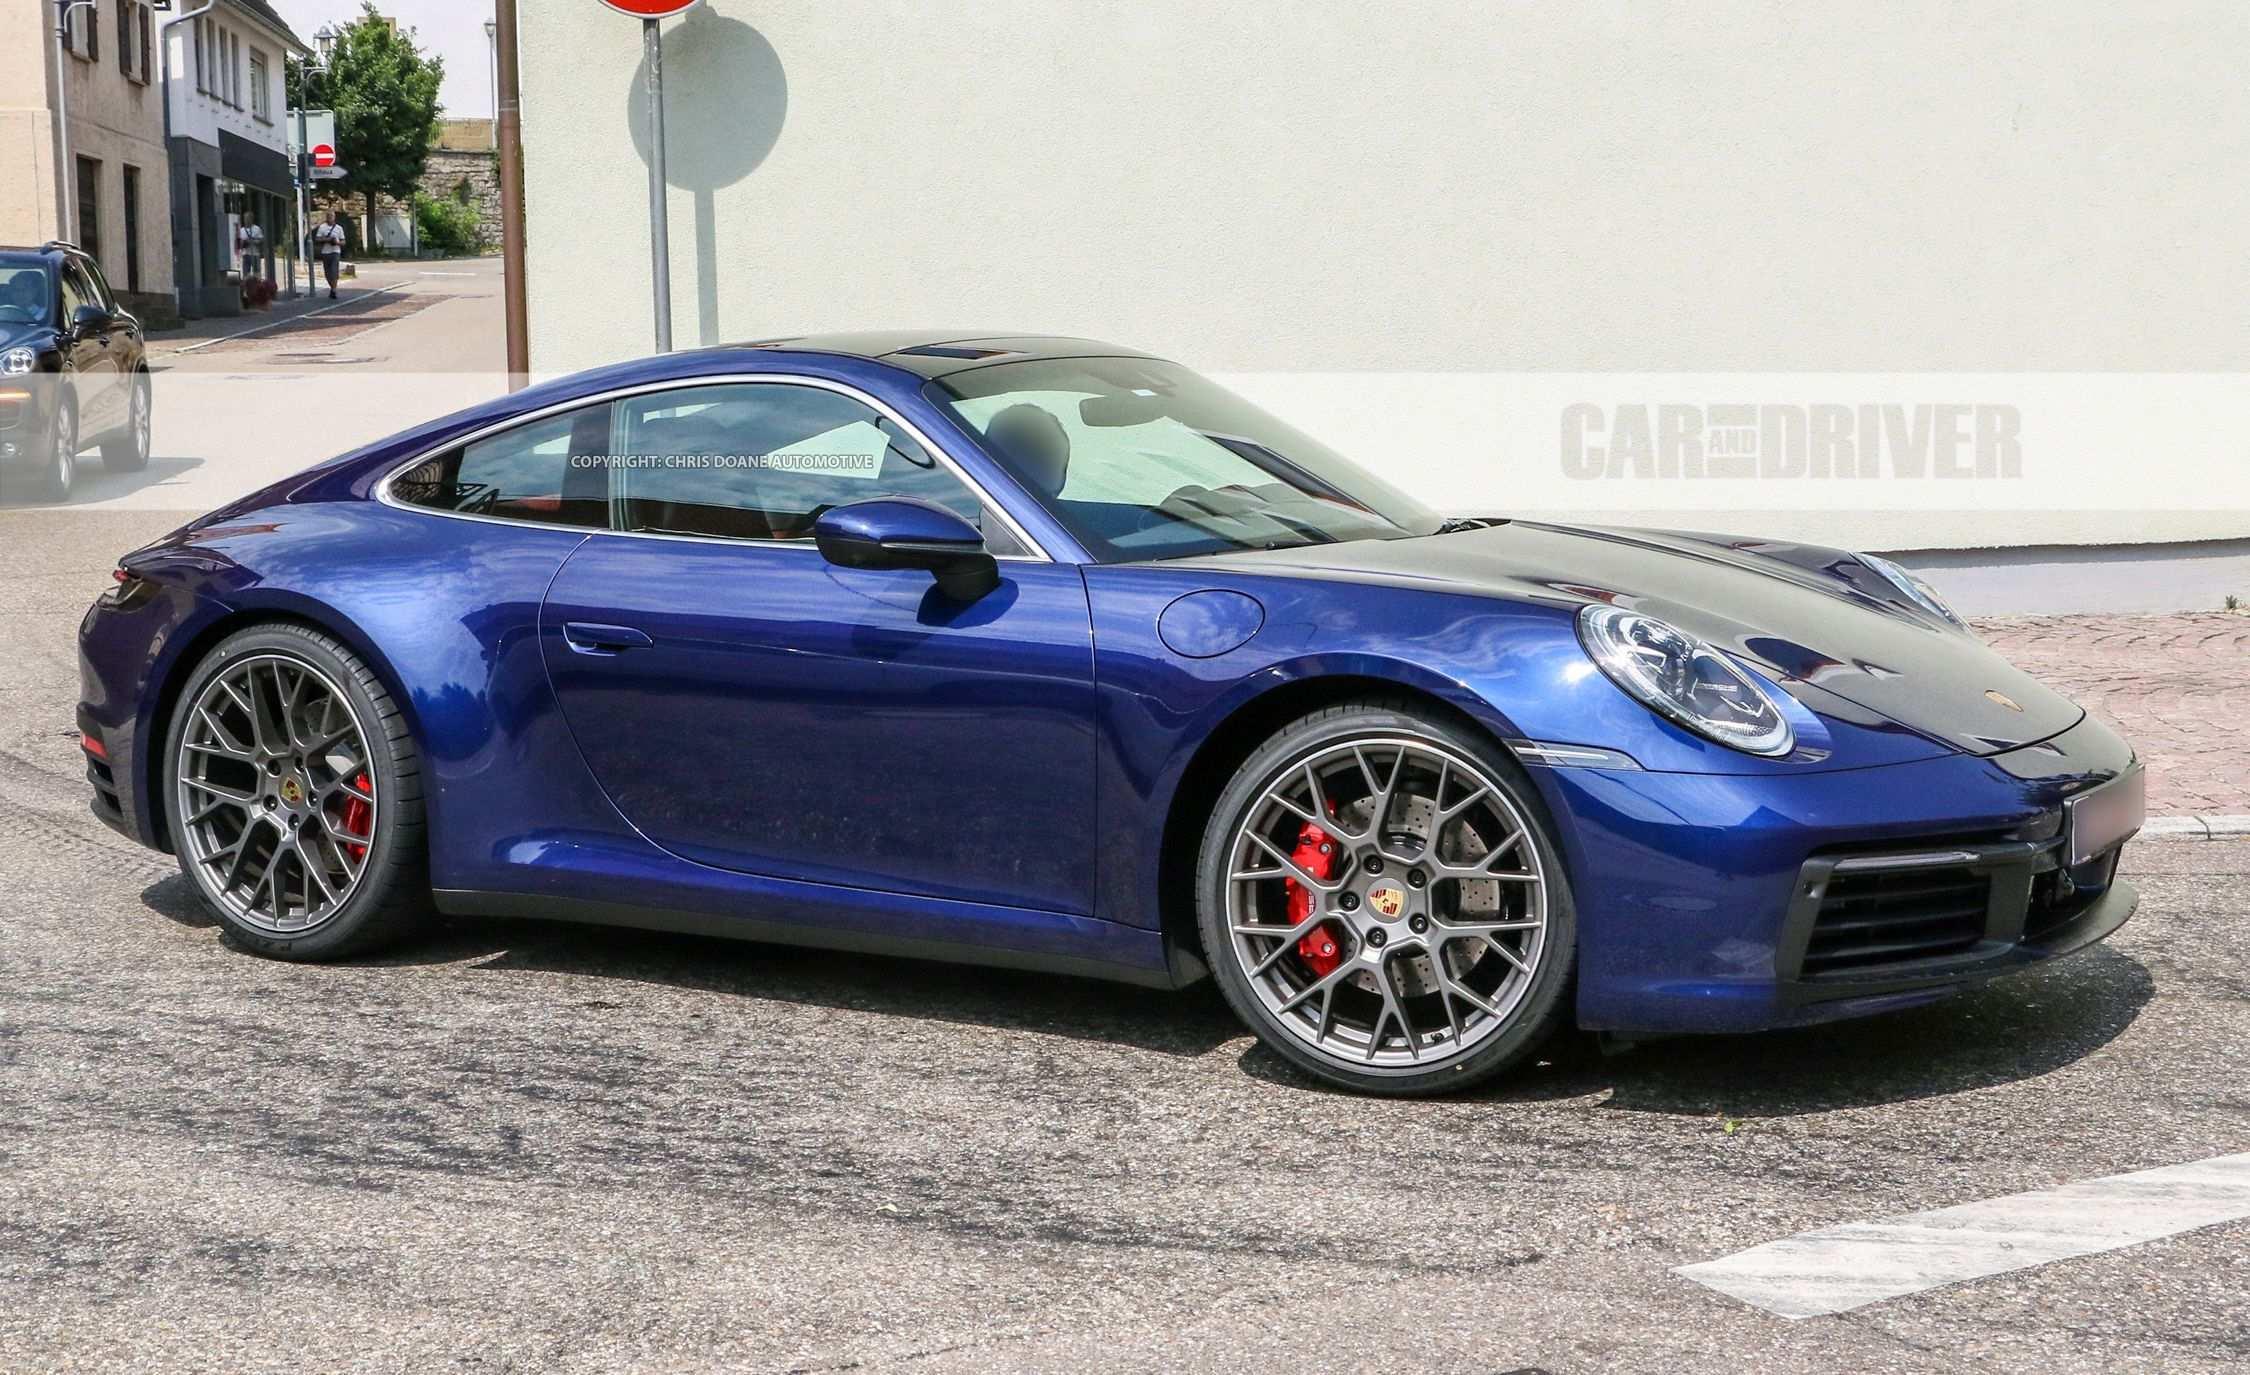 70 Concept of 2020 Porsche 911 Release Date by 2020 Porsche 911